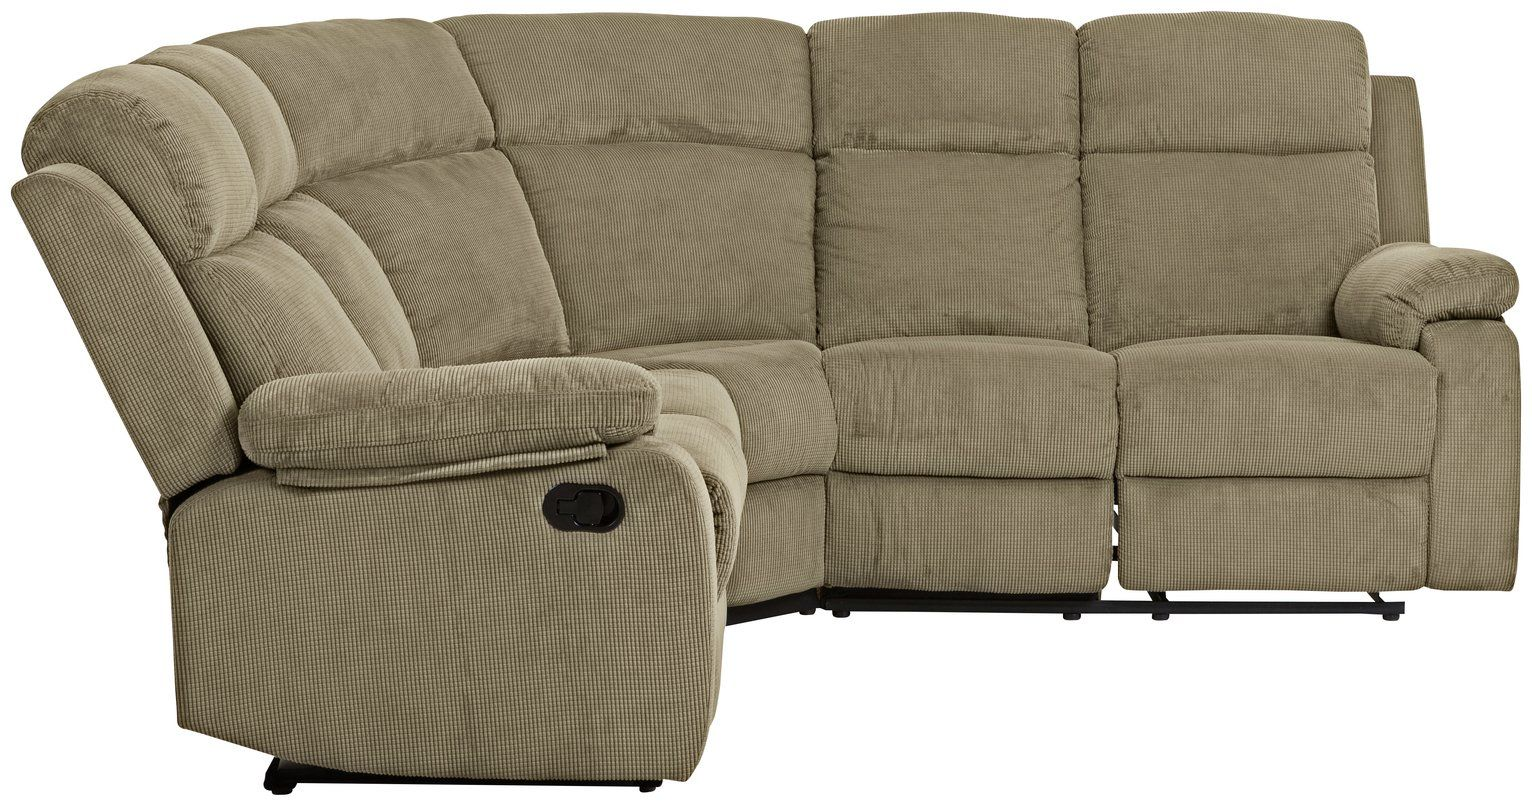 Argos Home New Bradley Fabric Recliner Corner Sofa Mink In 2020 Corner Sofa Corner Sofa Mink Recliner